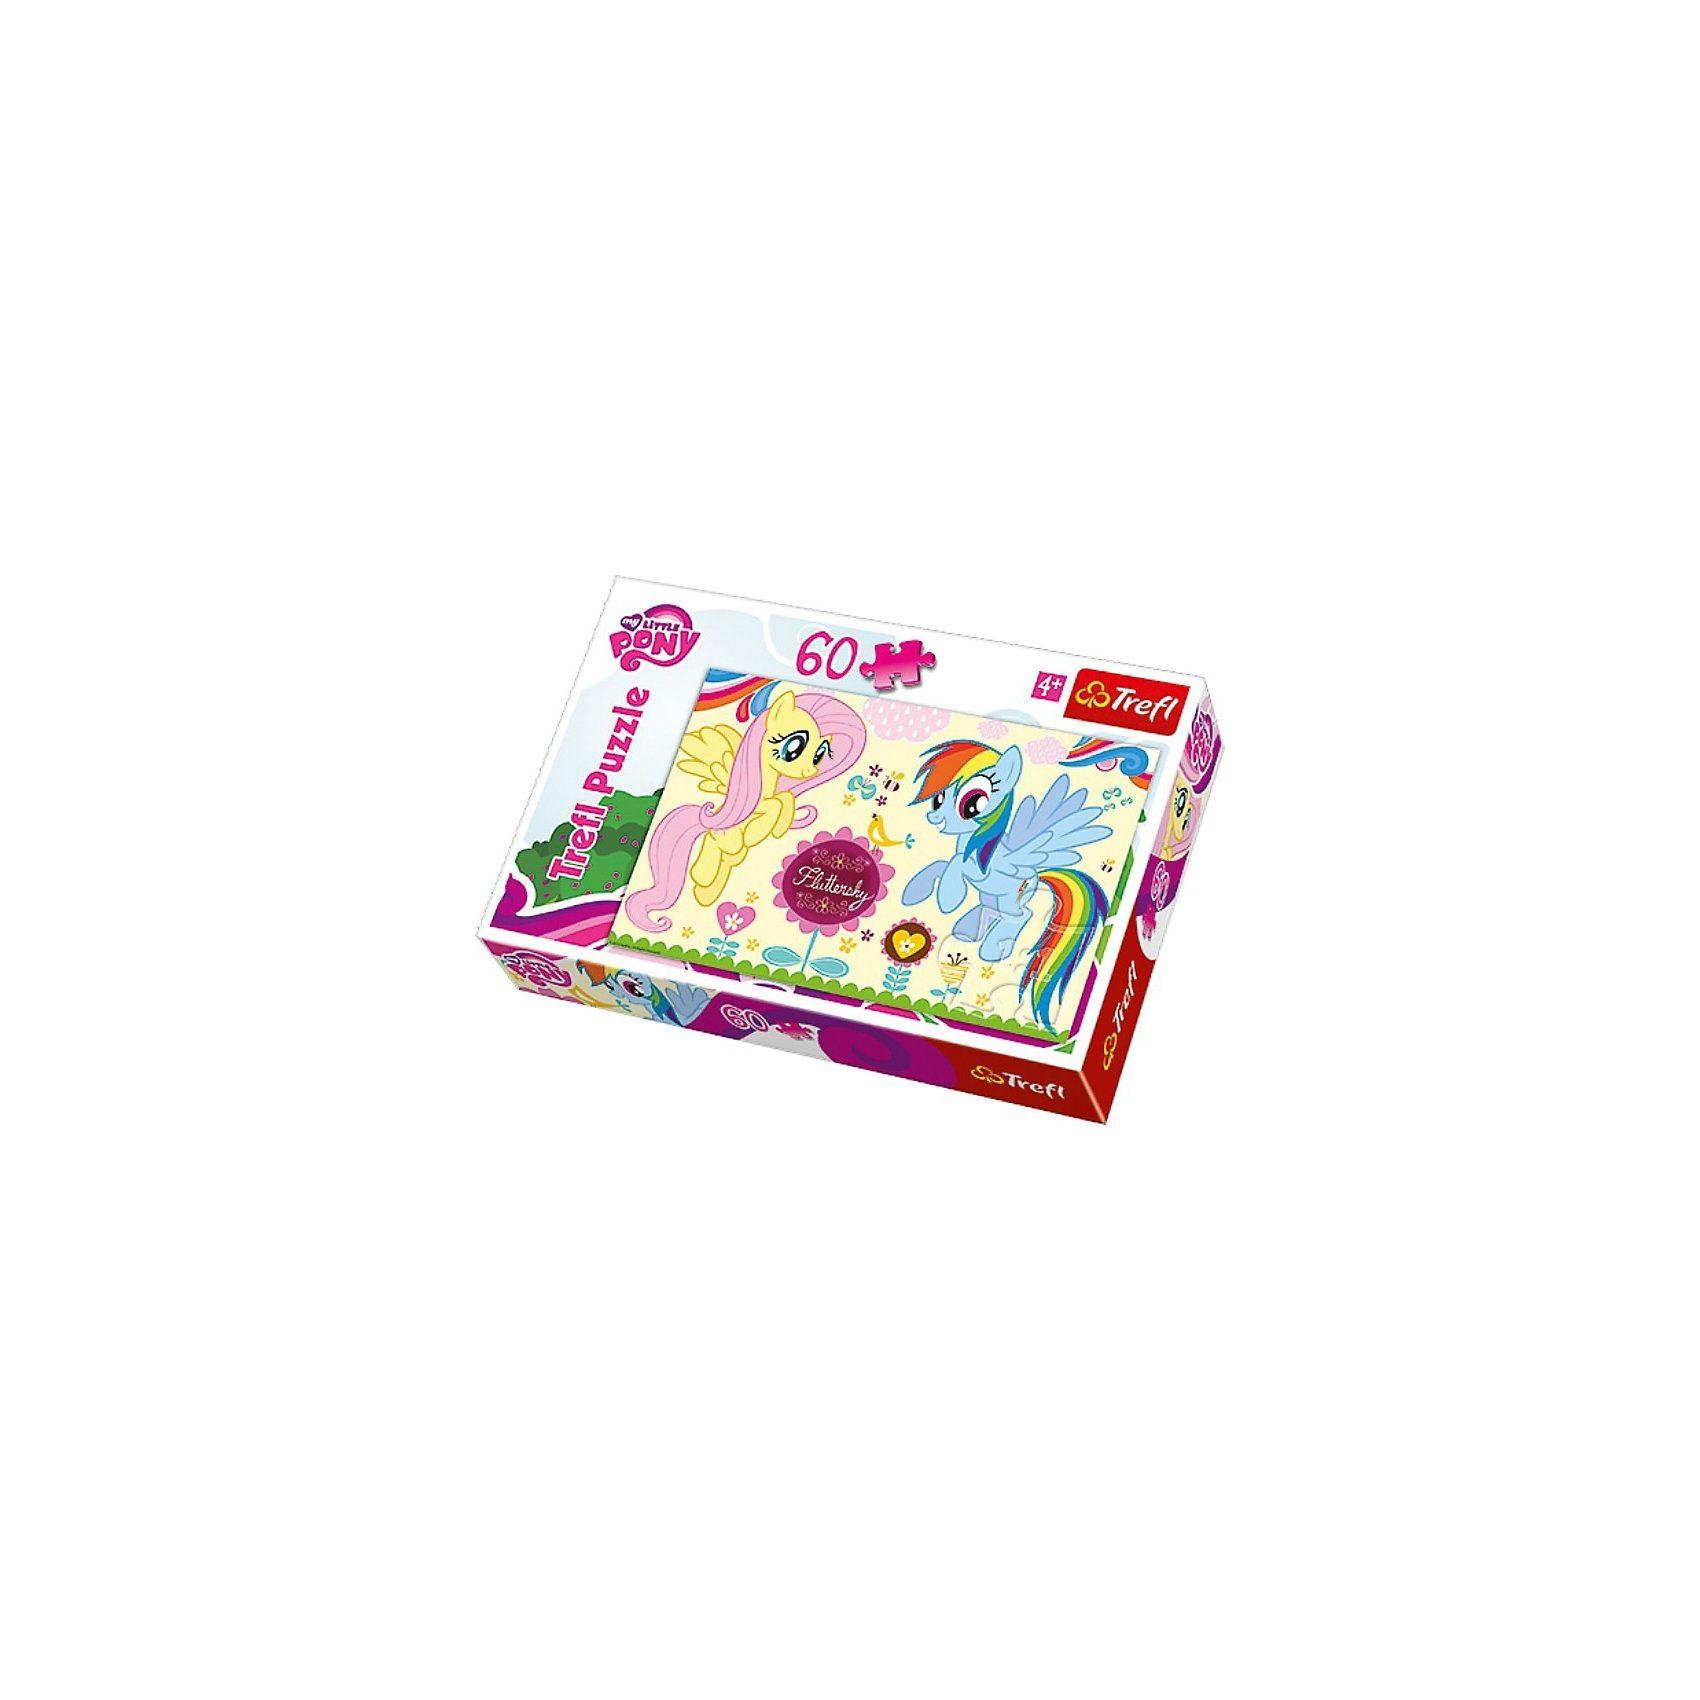 Trefl Puzzle 60 Teile - My Little Pony